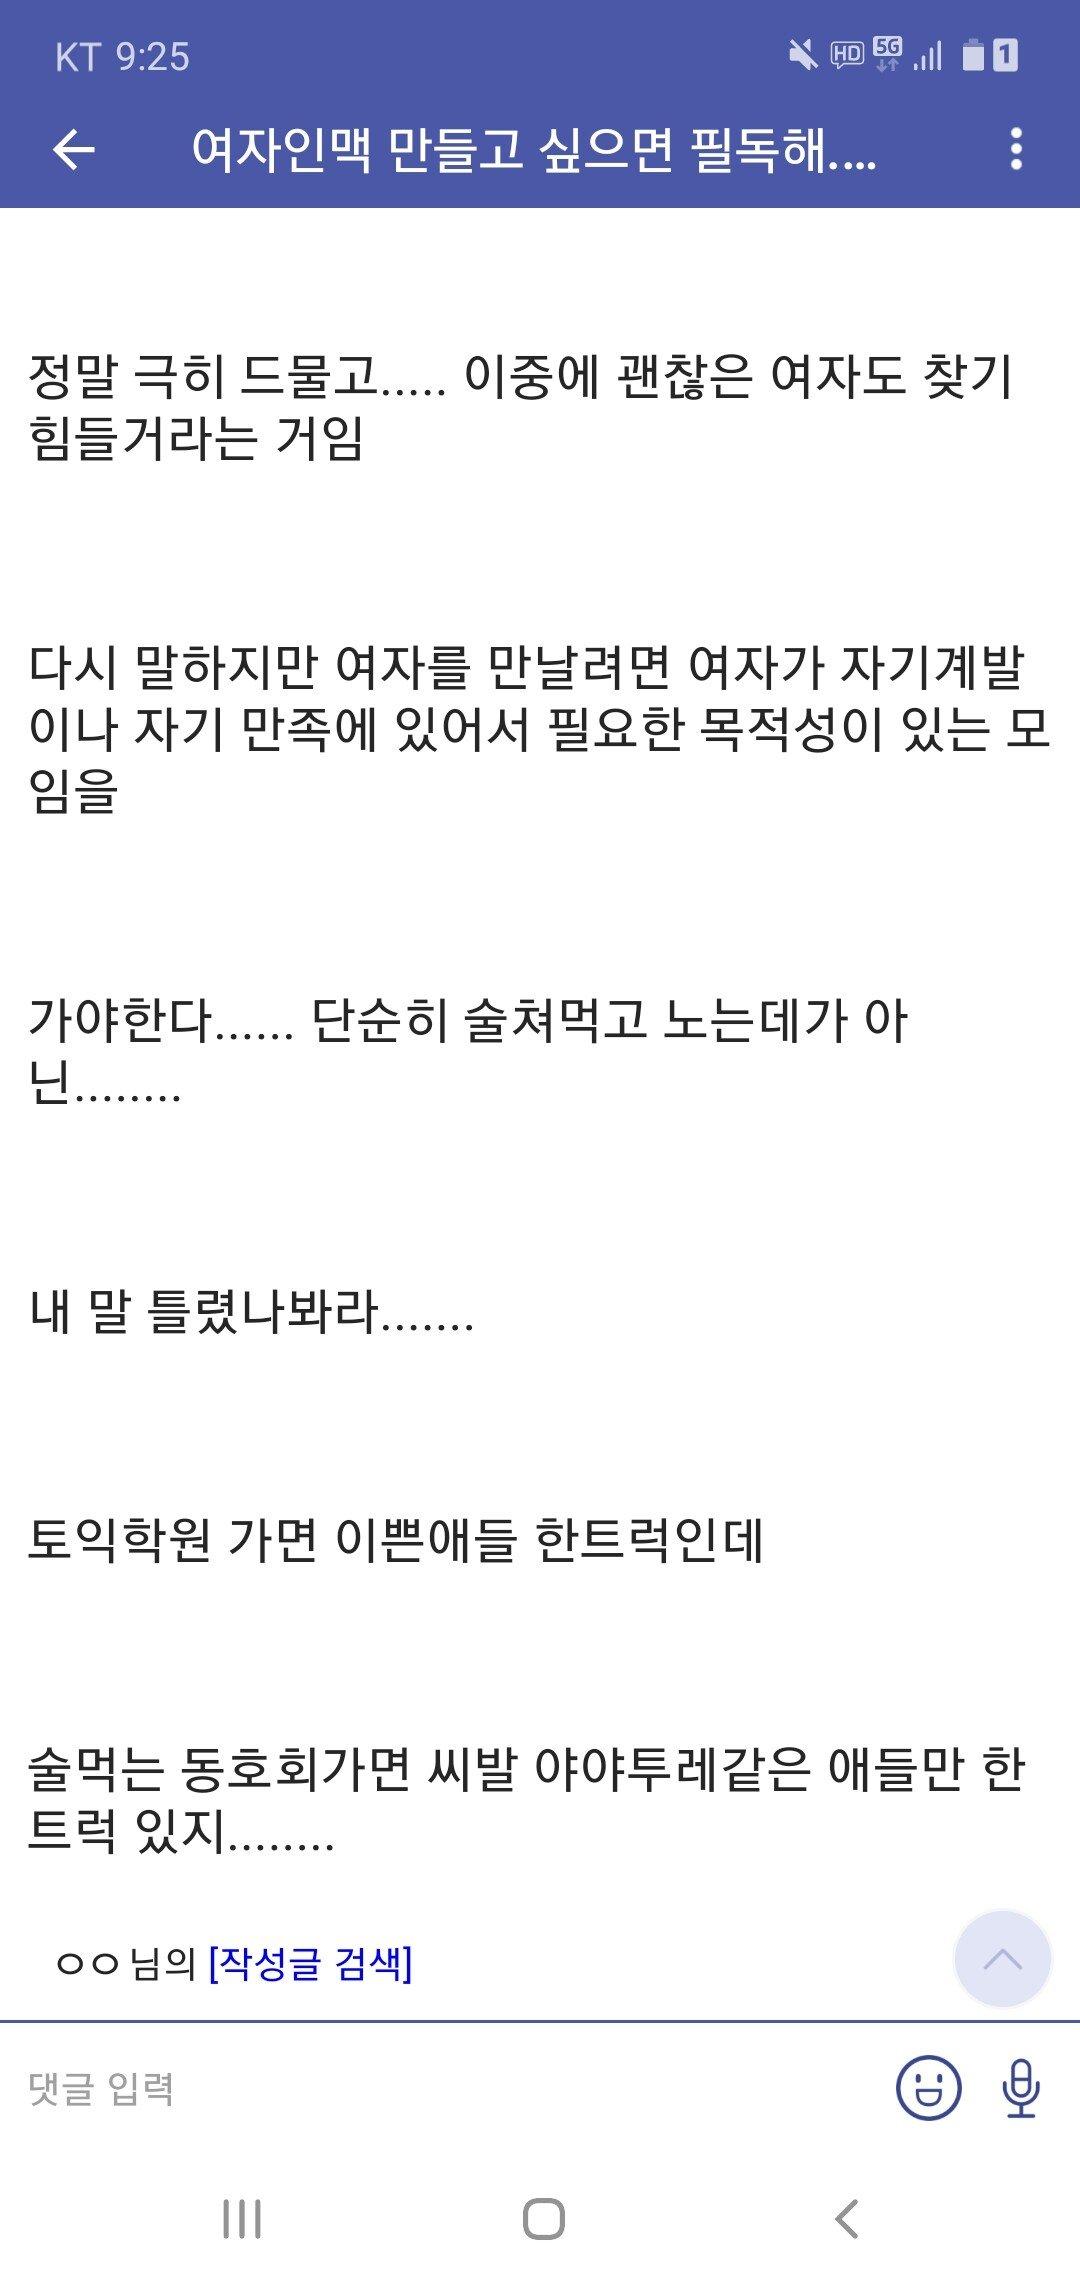 Screenshot_20201030-092547.jpg 야갤러가 말하는 여자인맥 만드는 법.jpg